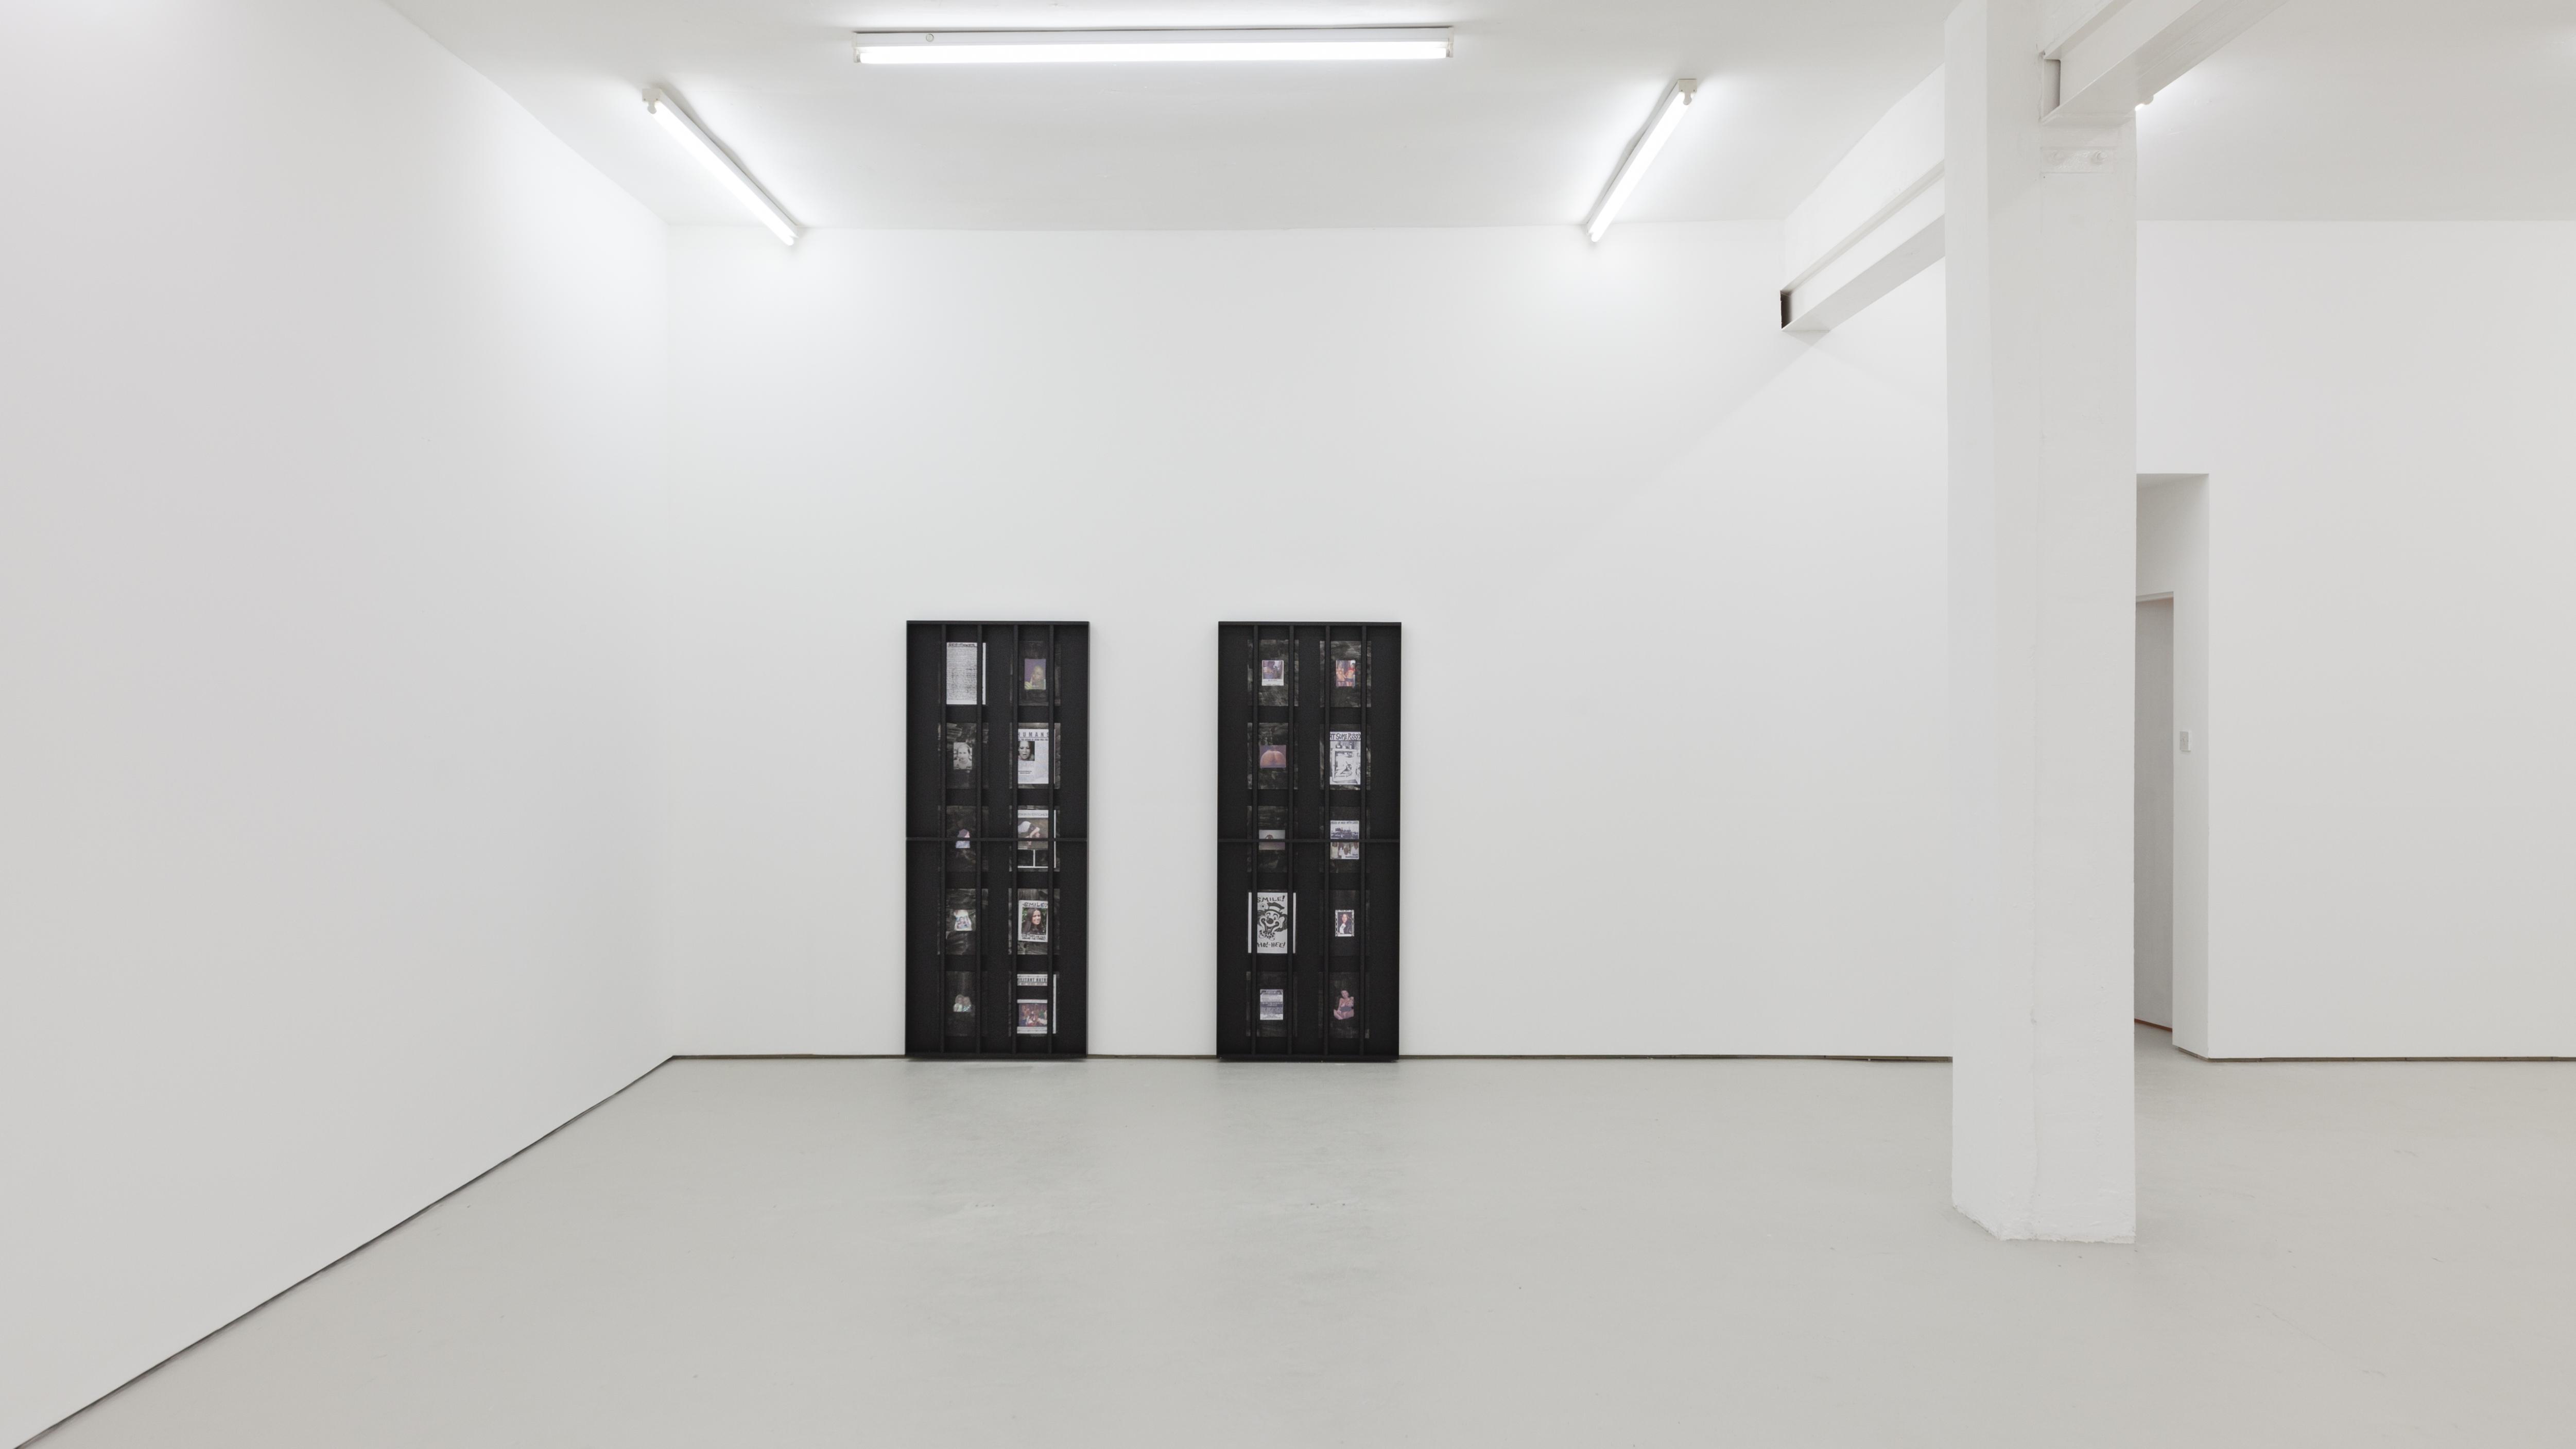 Darja Bajagić, Nobody Knows I'm Funny (2016). Installation view. Courtesy Carlos/Ishikawa, London.